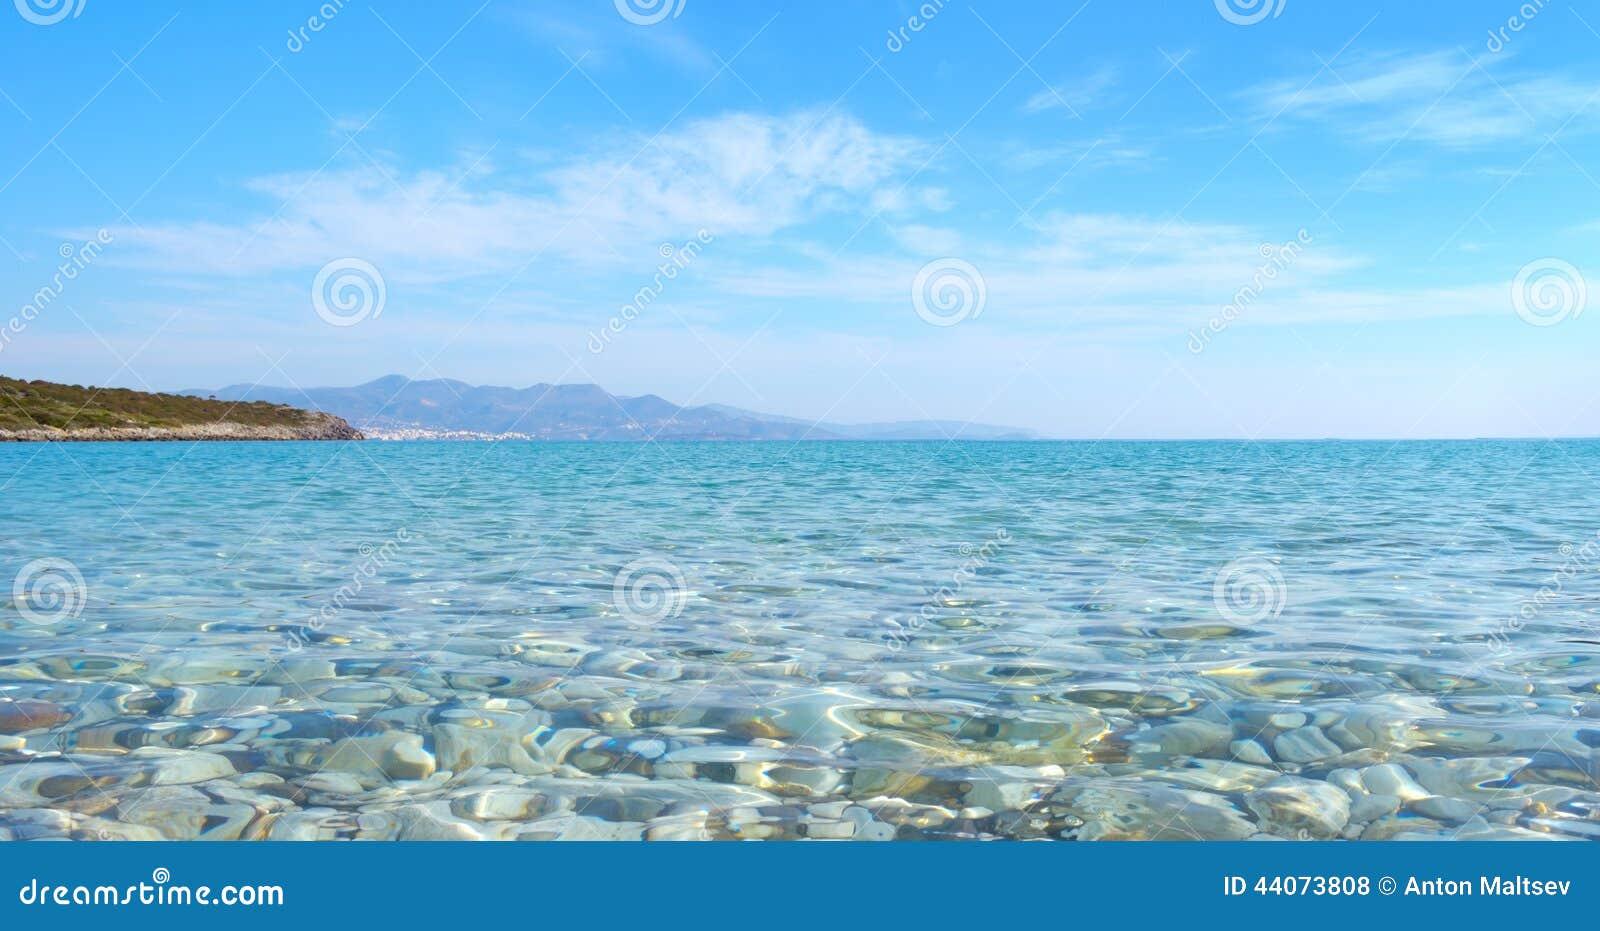 Mirabello Bay Crete, Greece Stock Photo - Image: 44073808